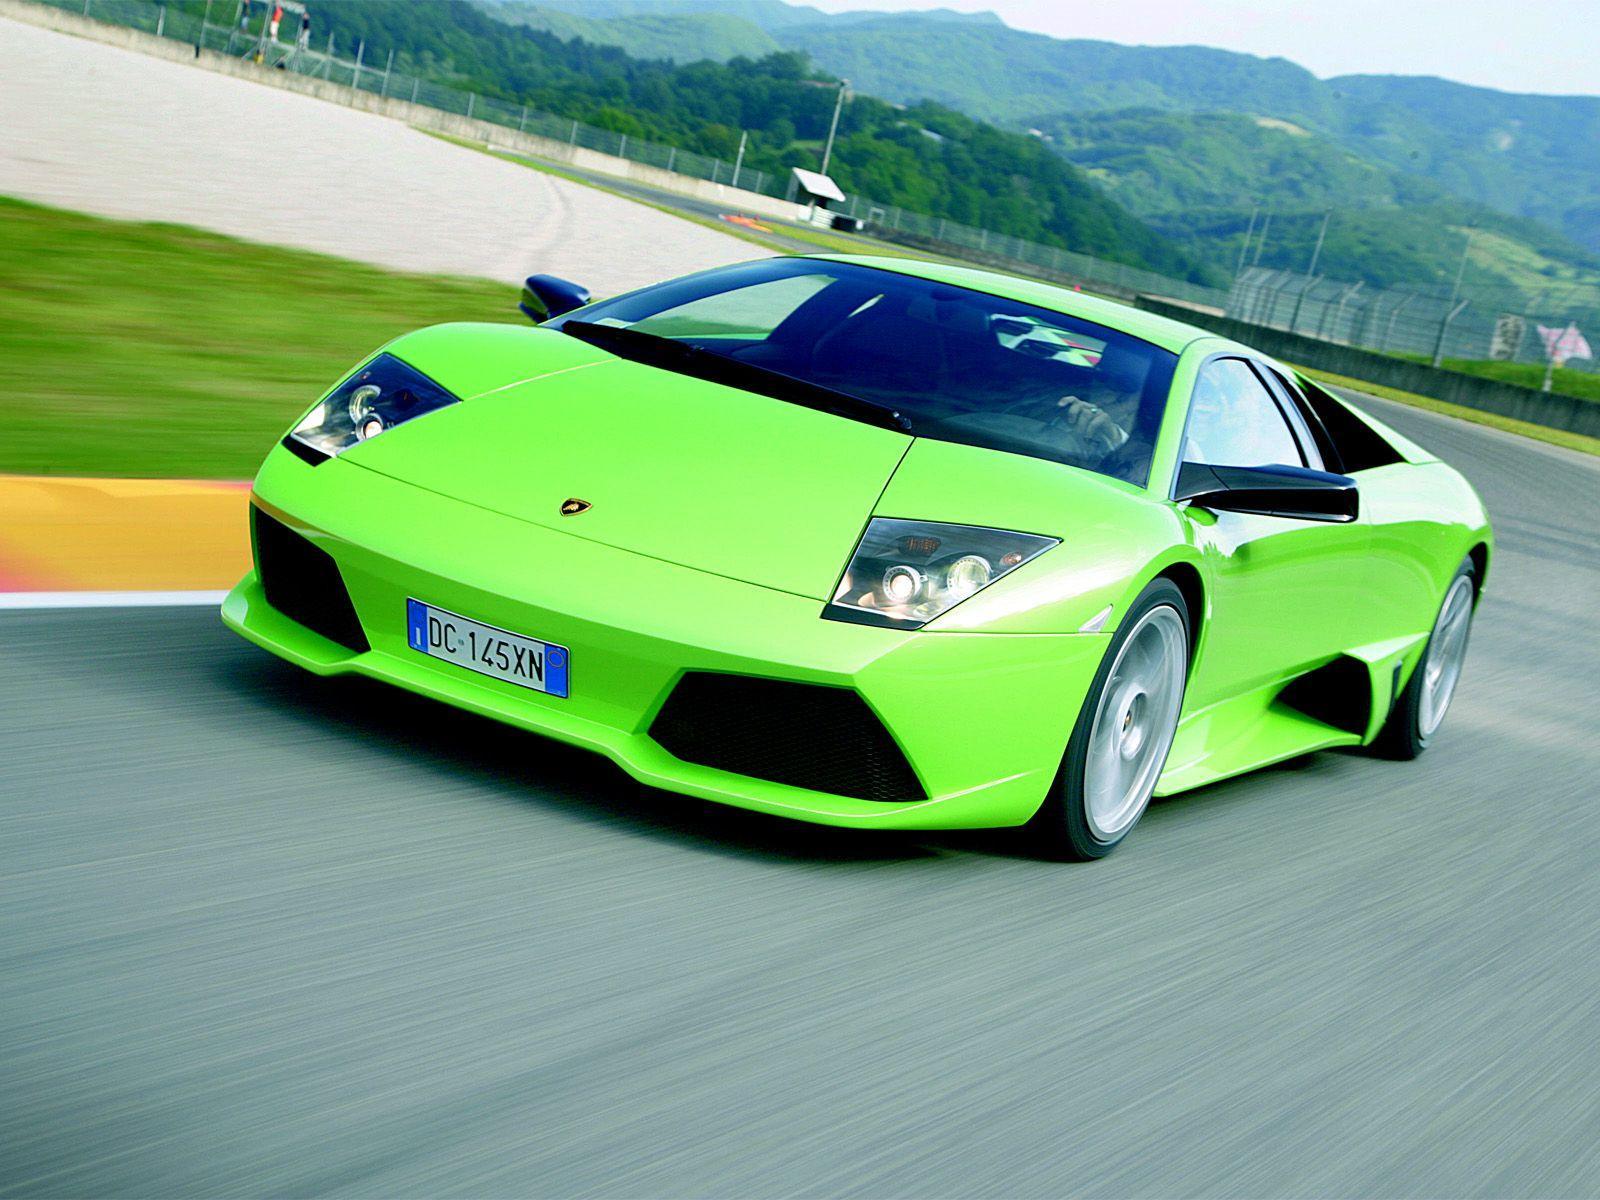 1920x1080 Hd Wallpaper Neon Cool Wallpapers Lamborghini Colors 1080p For